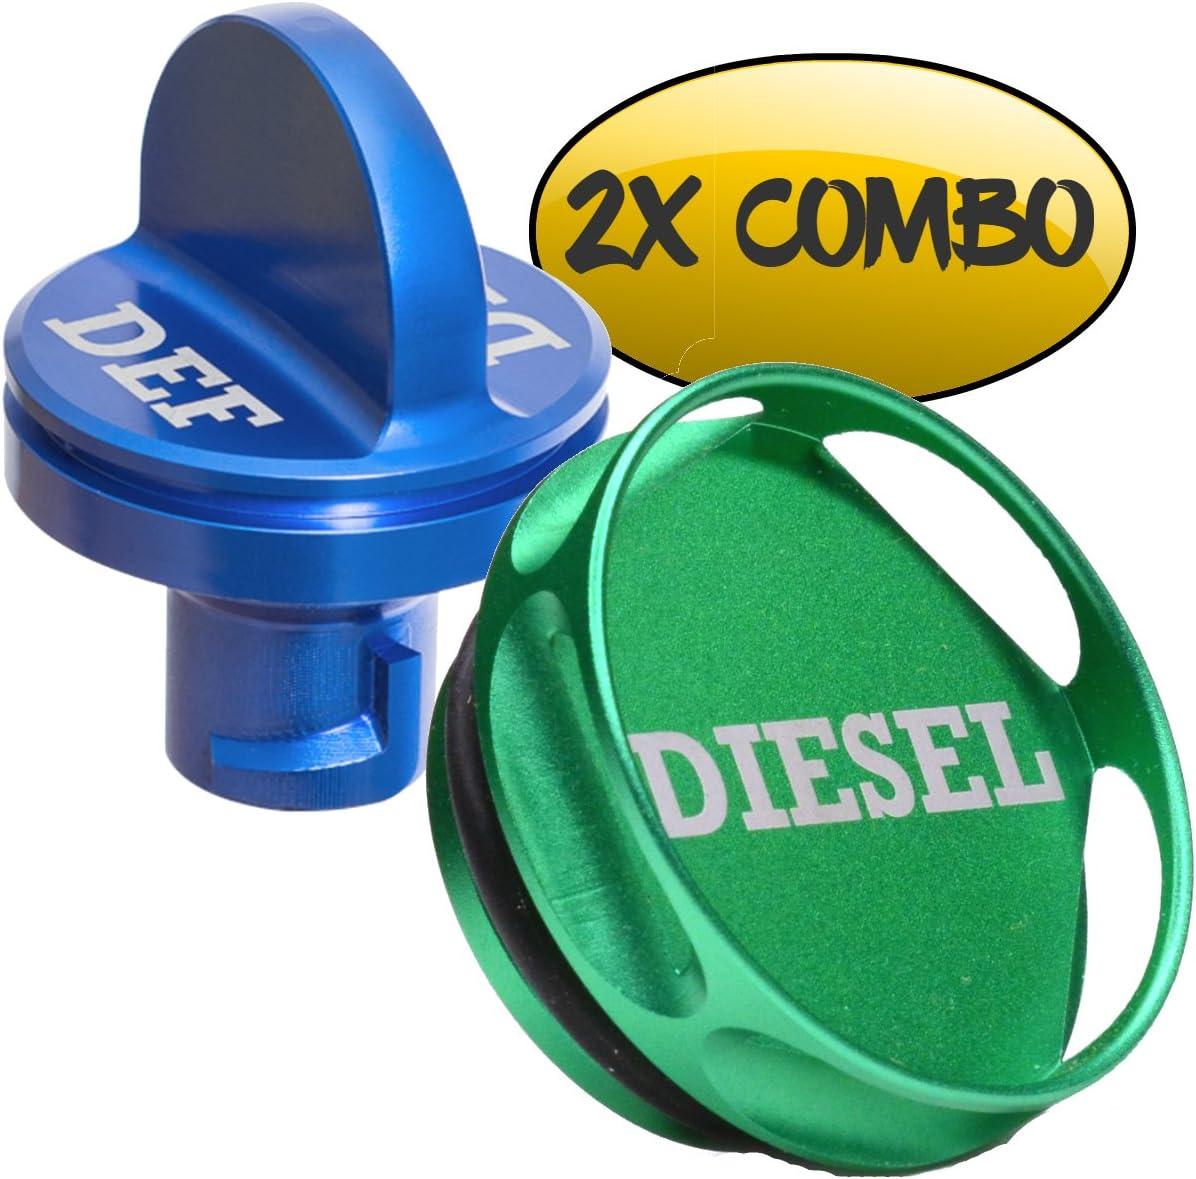 New Easy Grip Design Combo Pack Magnetic Diesel Fuel Cap /& DEF Cap for Dodge RAM Trucks Dodge Ram Diesel Trucks 1500 2500 3500 with 6.7 CUMMINS EcoDiesel 2013-2018